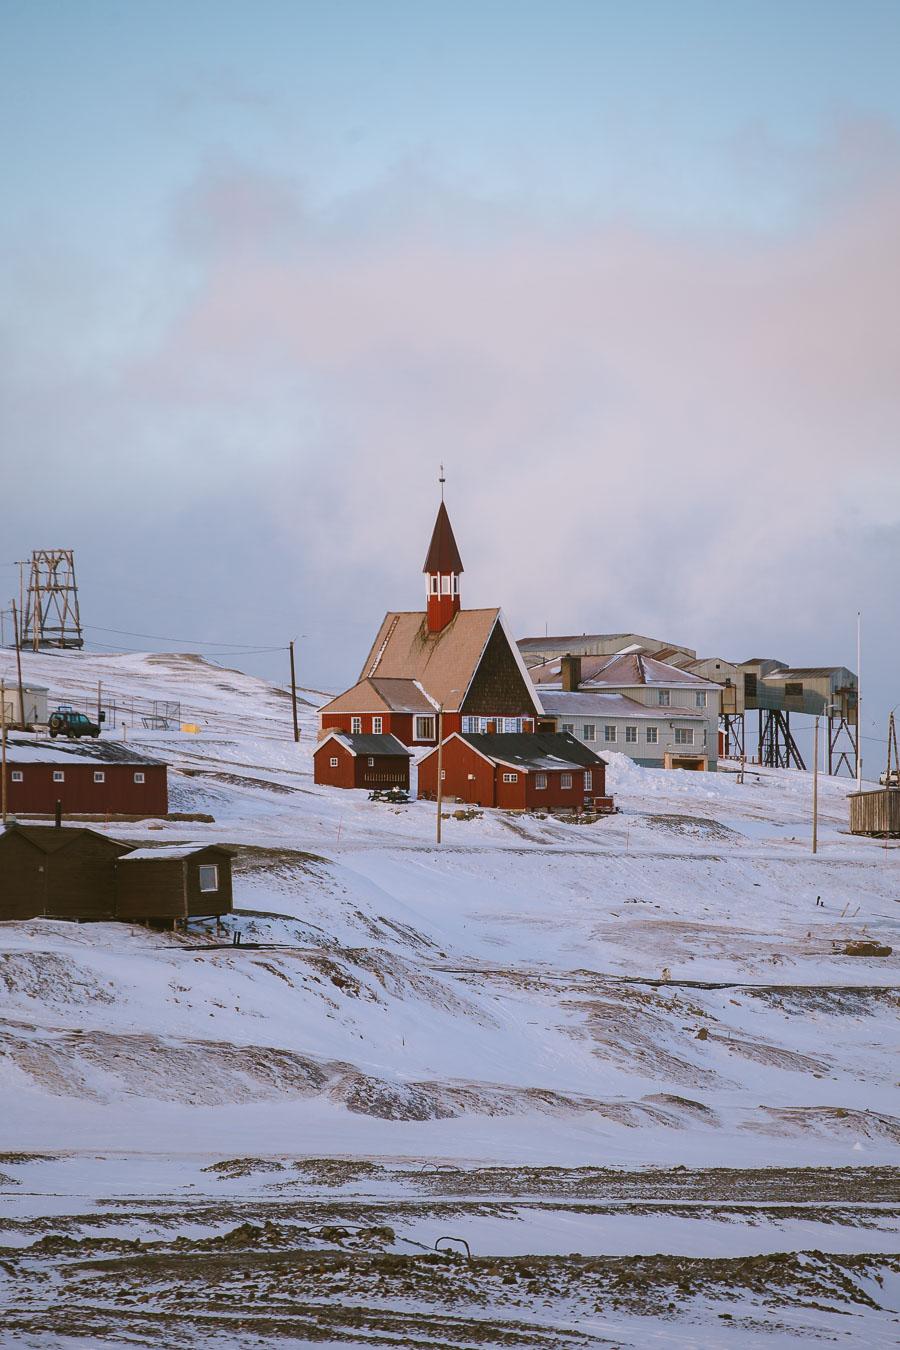 The church of Longyearbyen on Svalbard